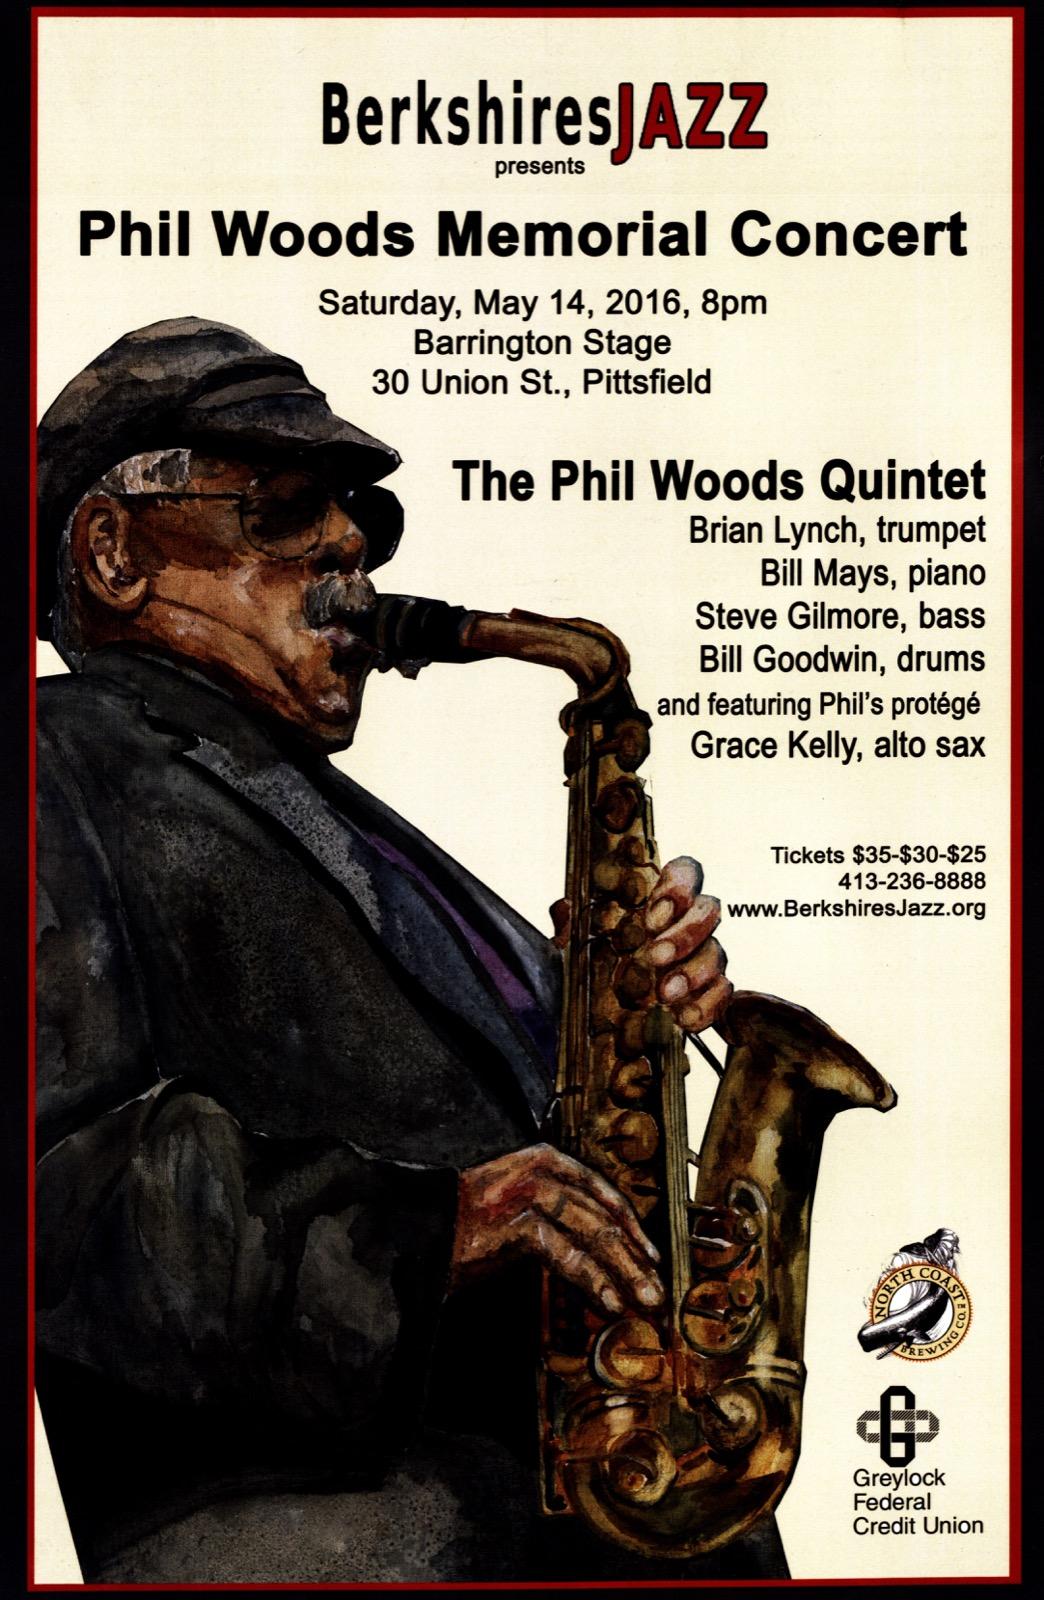 Phil_Woods_Memorial_Concert.jpg